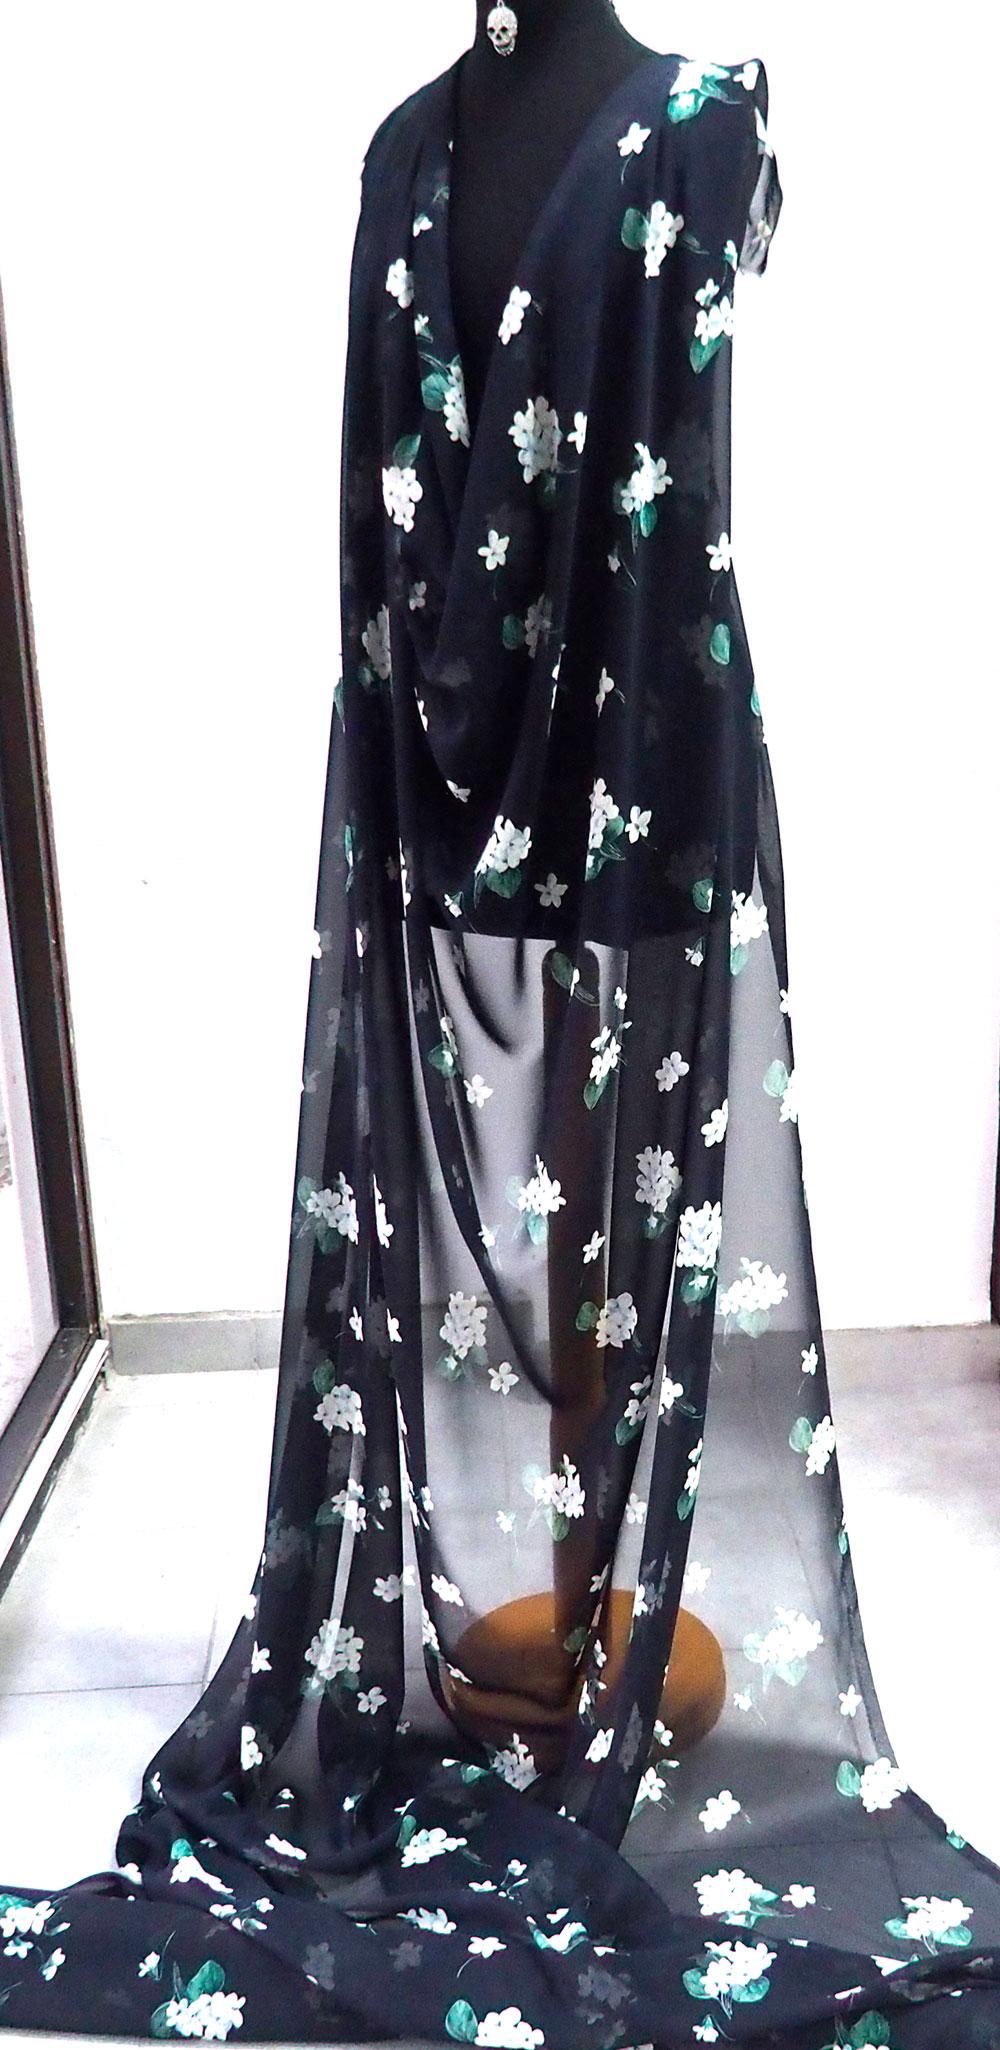 856fe4cb8a96a silk chiffon print fabric large floral print navy blue background green  white kaftan kimono evening 140cm wide Italy